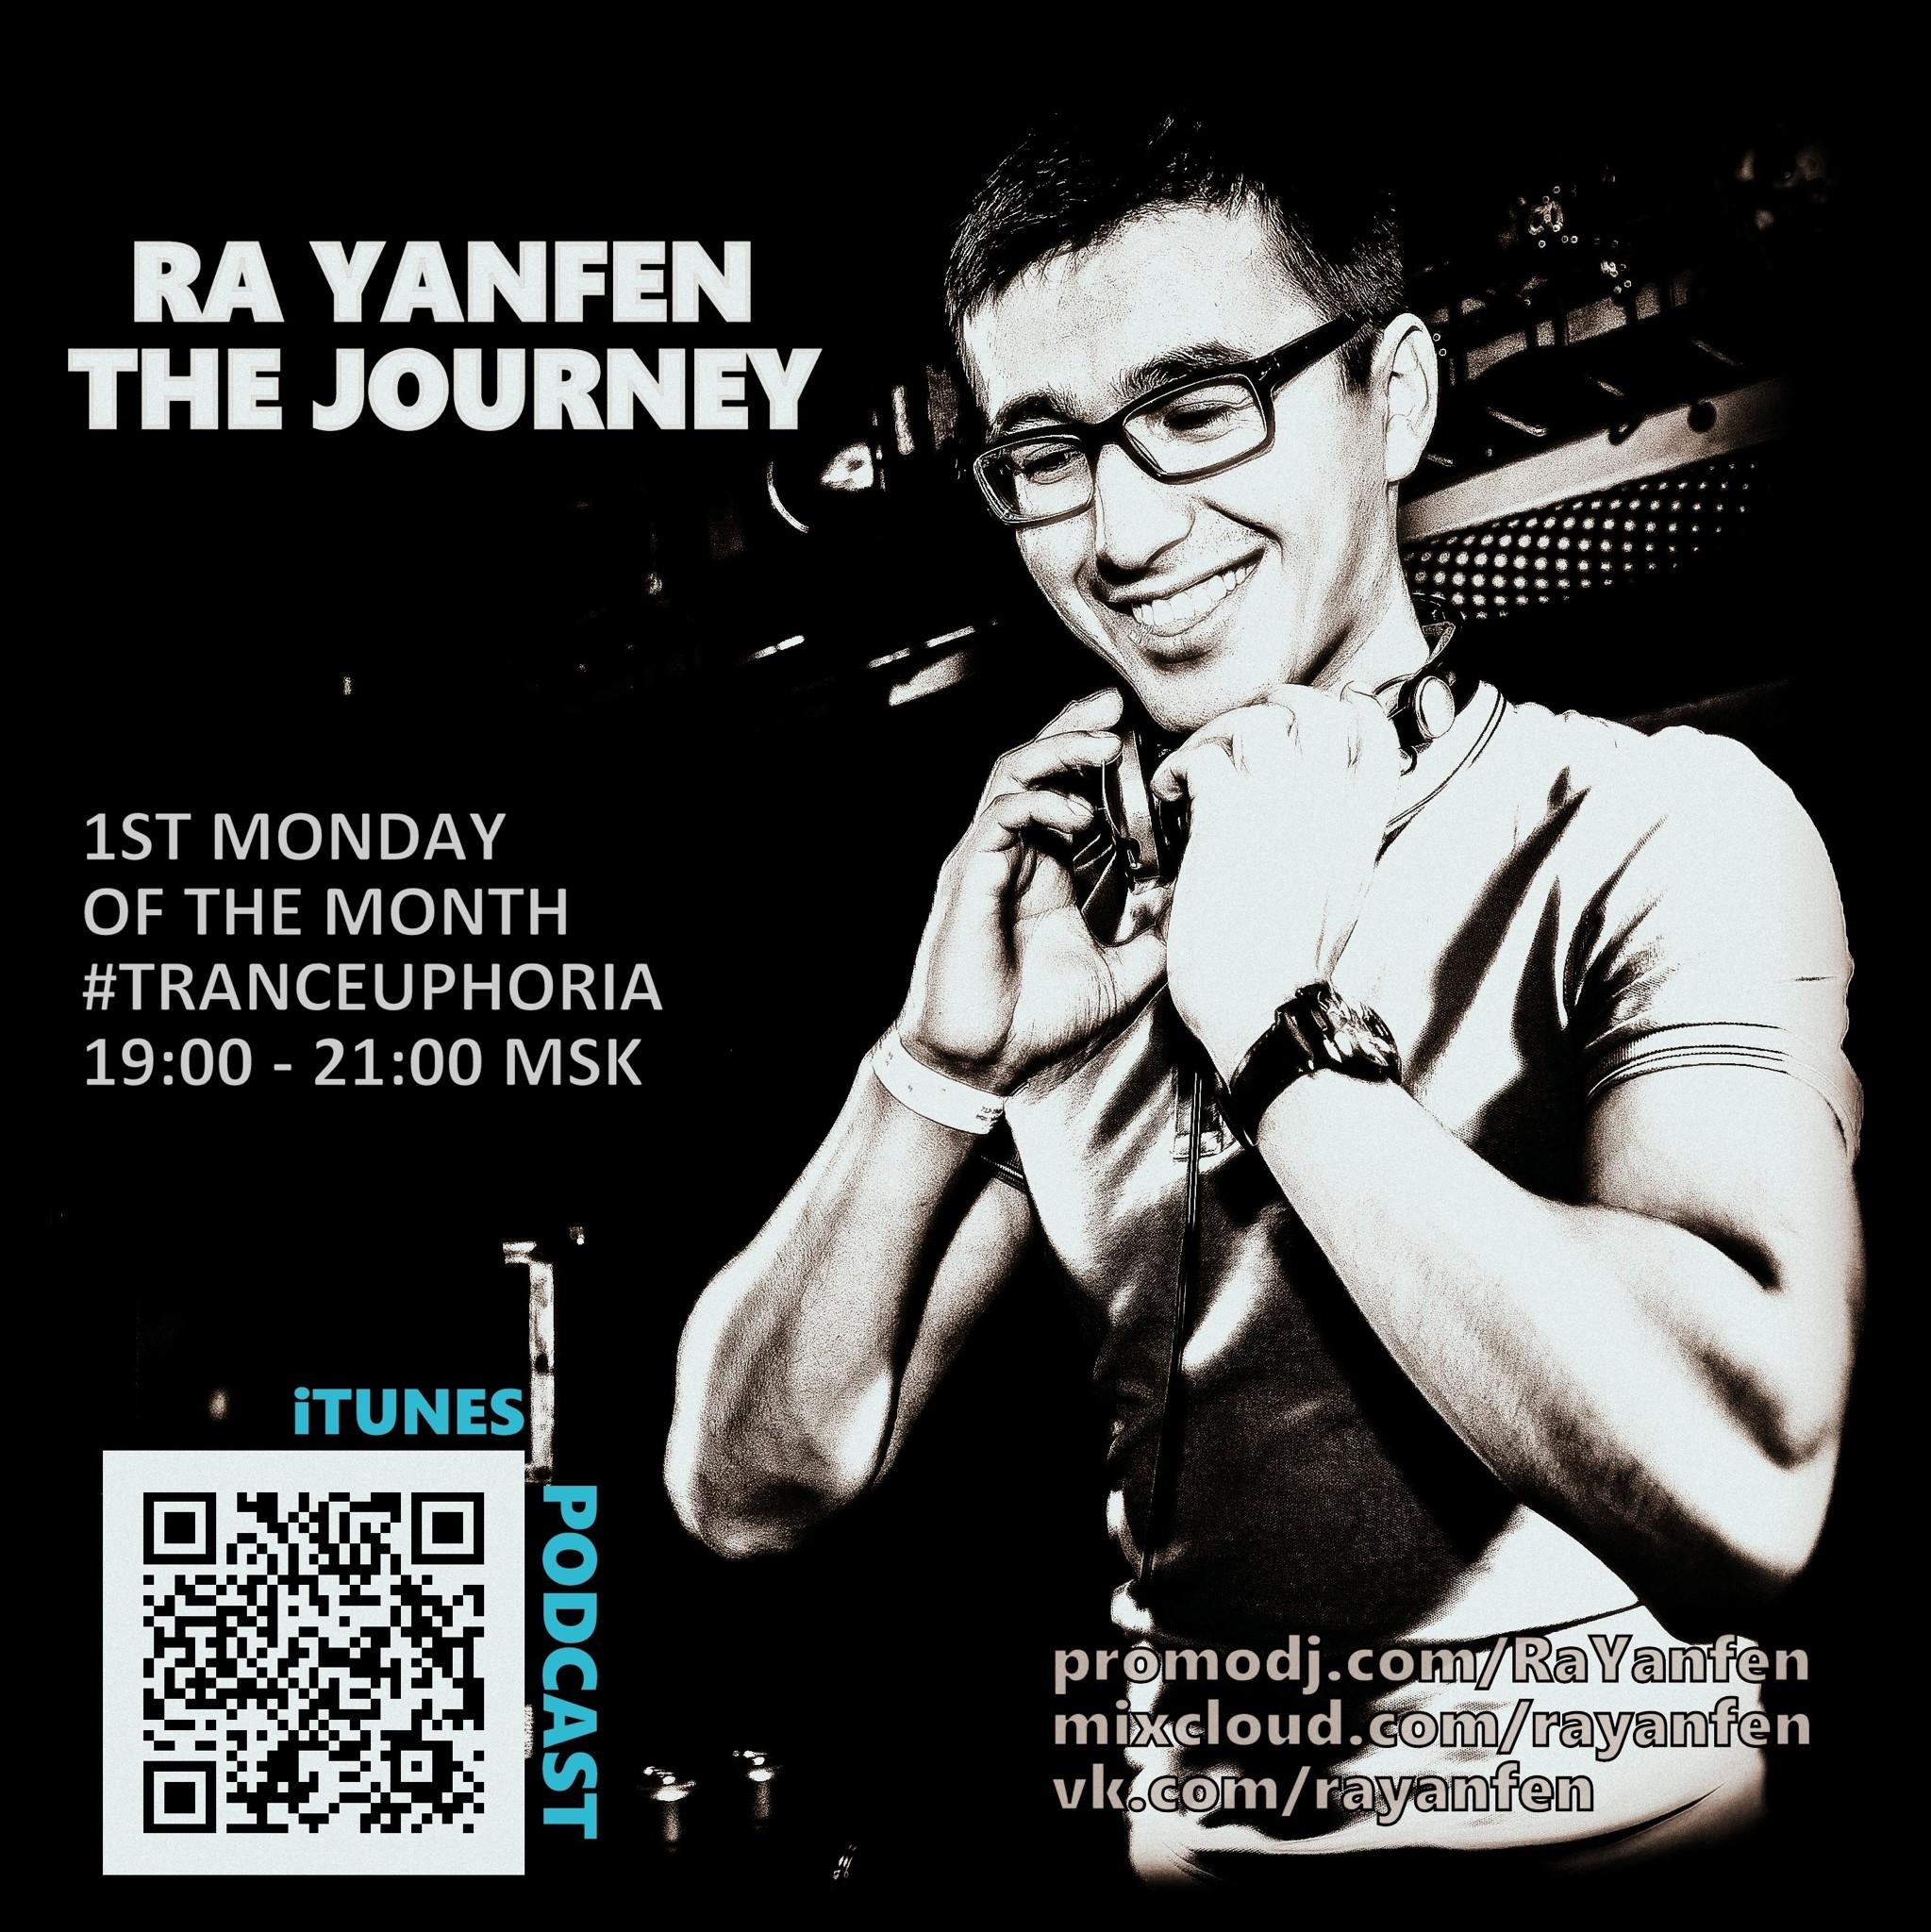 Ra Yanfen